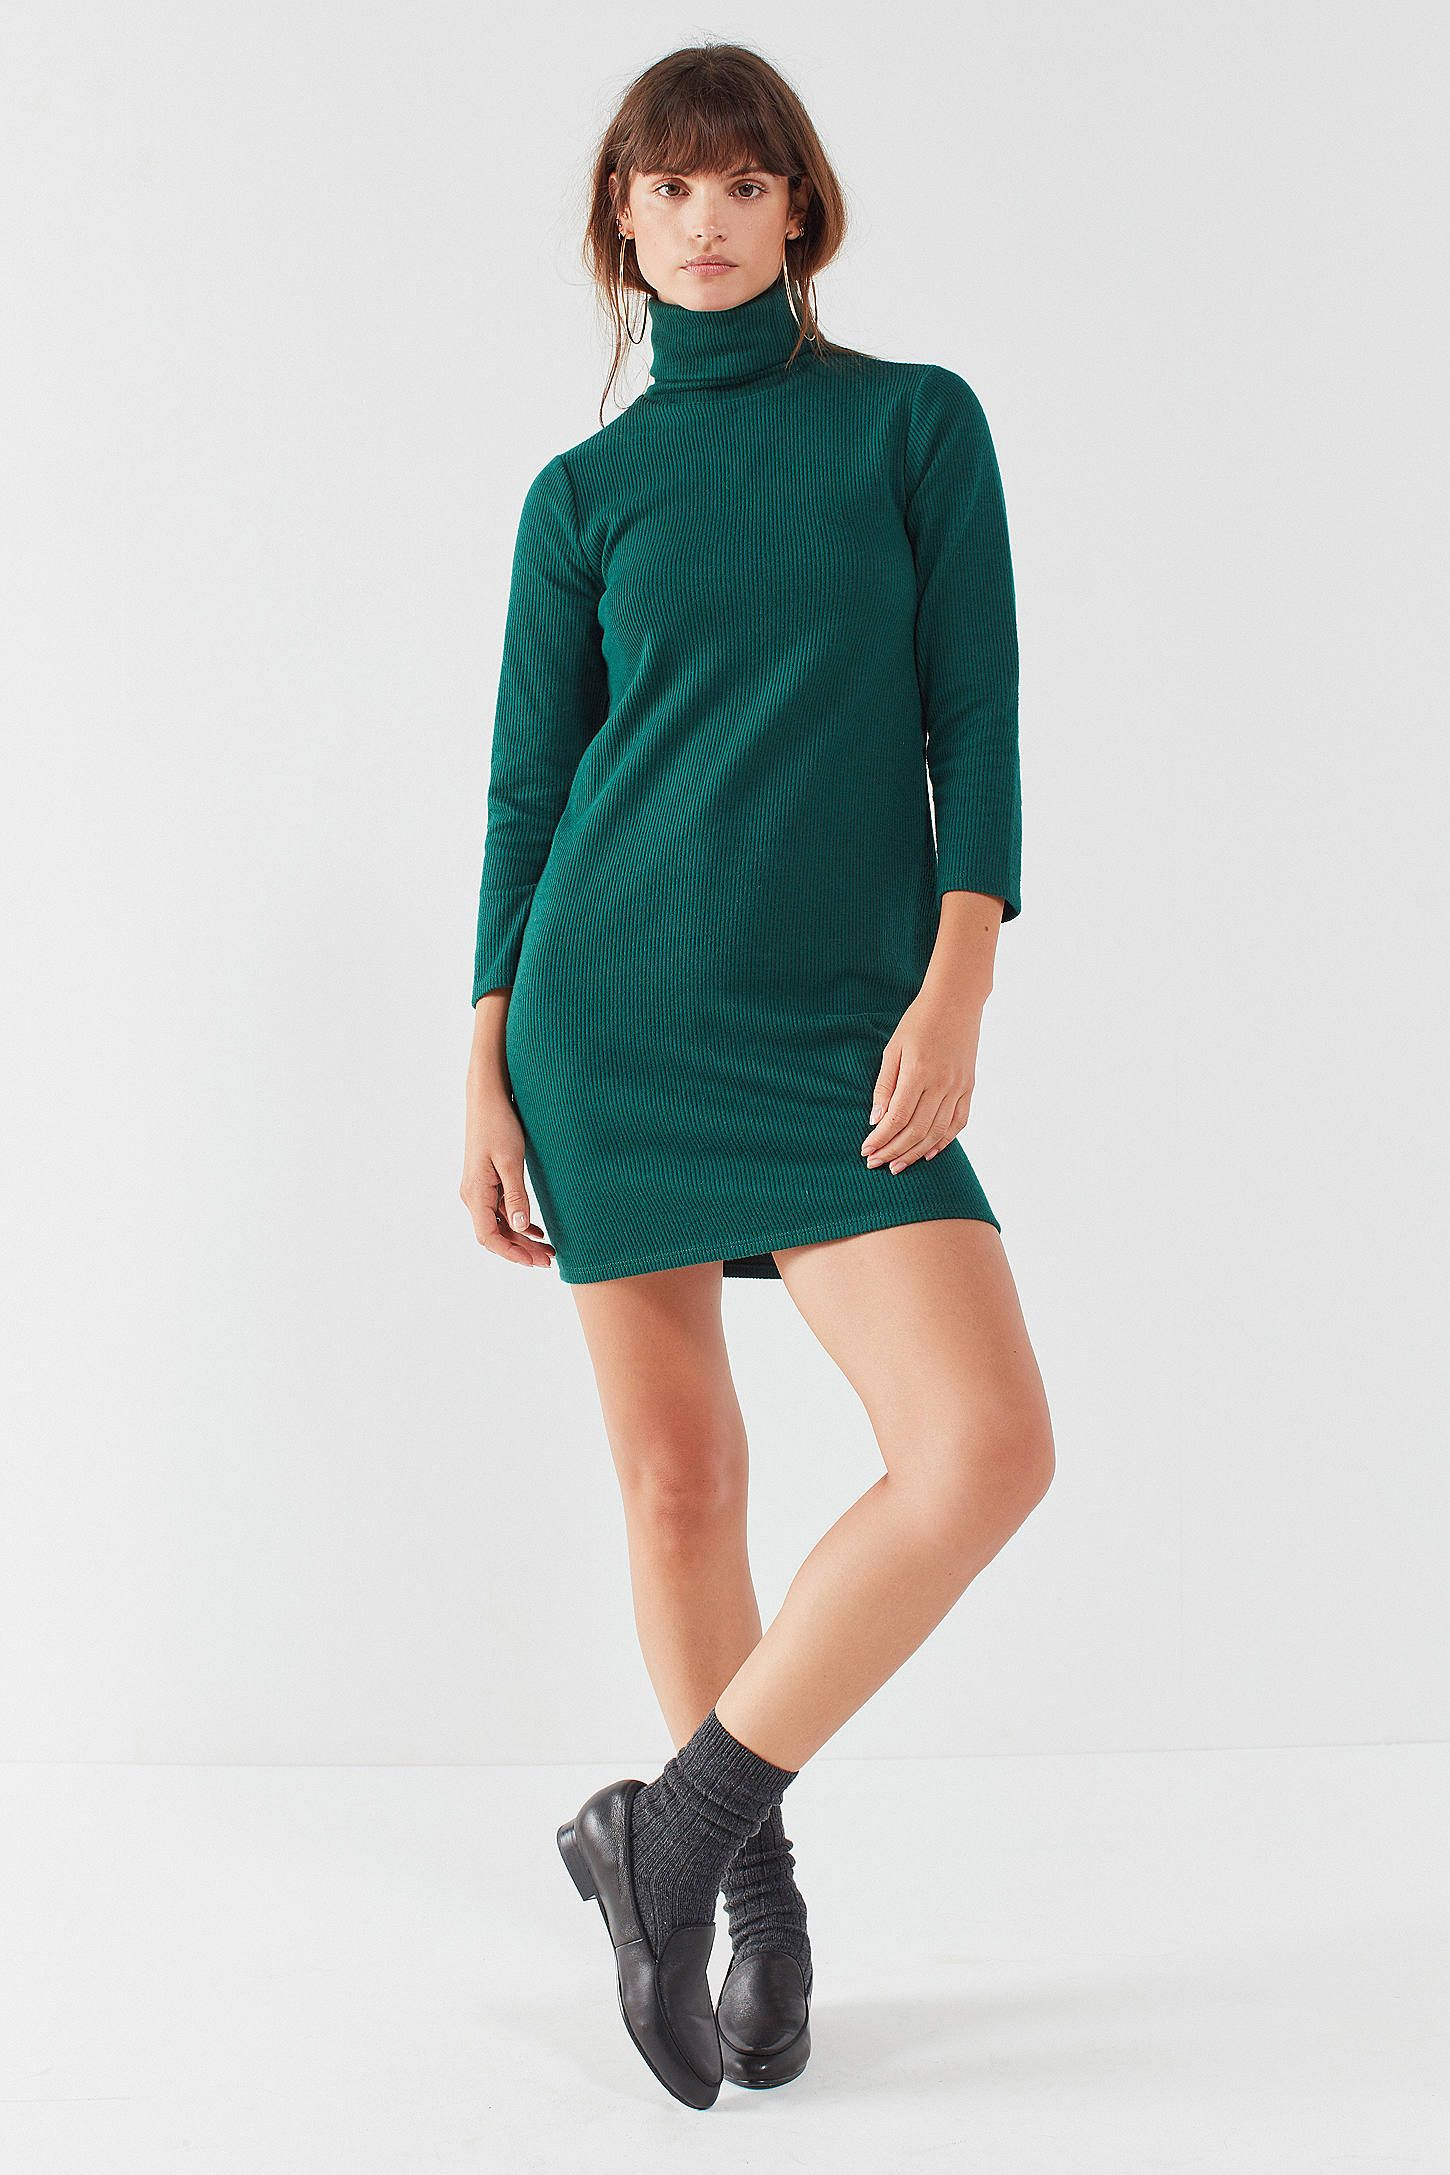 Pins Needles Tucker Green Ribbed Turtleneck Mini Dress [ 2175 x 1450 Pixel ]